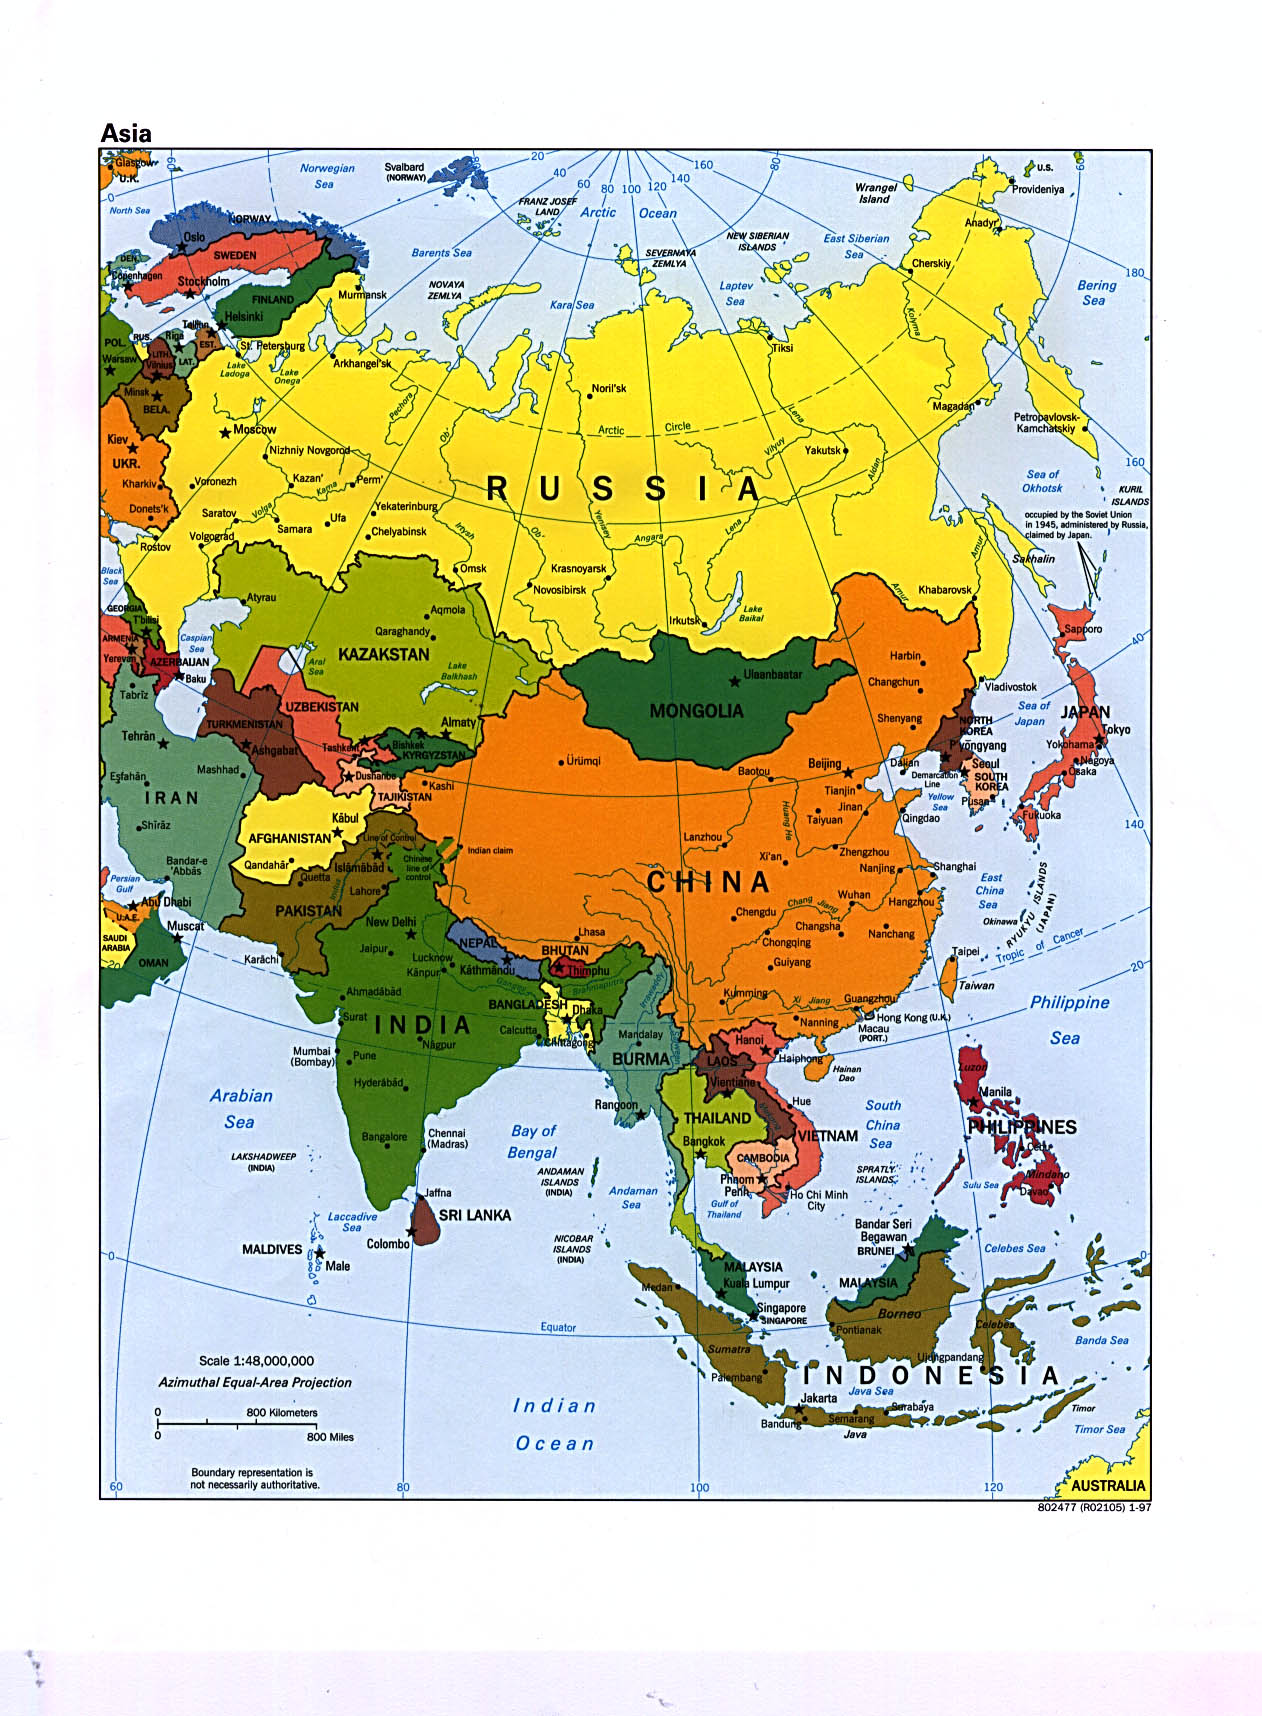 Mapa Politico de Asia 1997